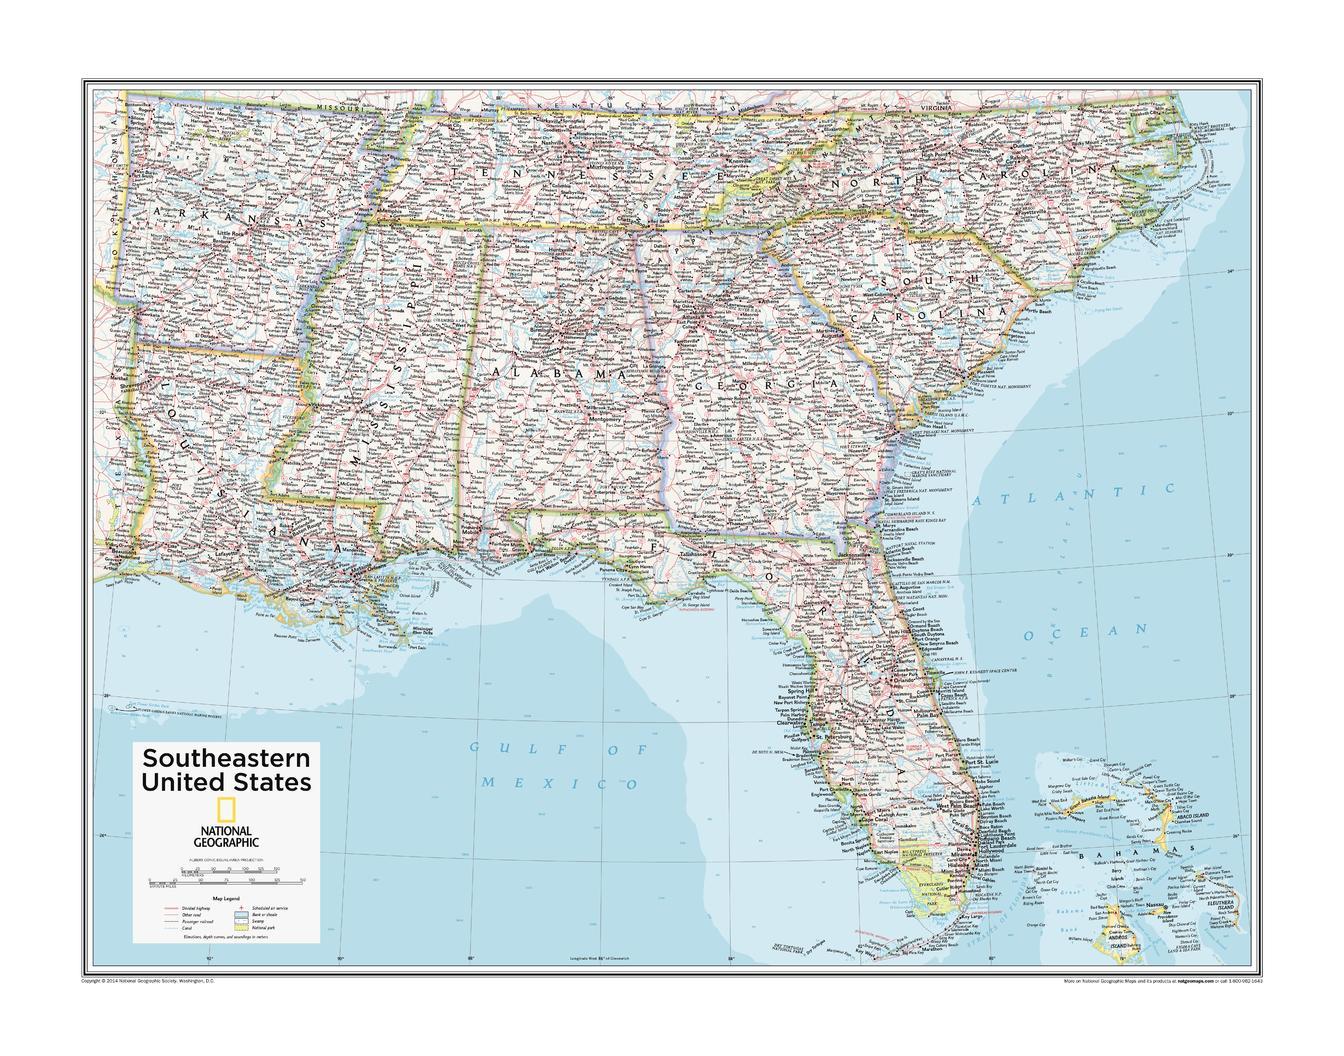 Southeastern U.S.